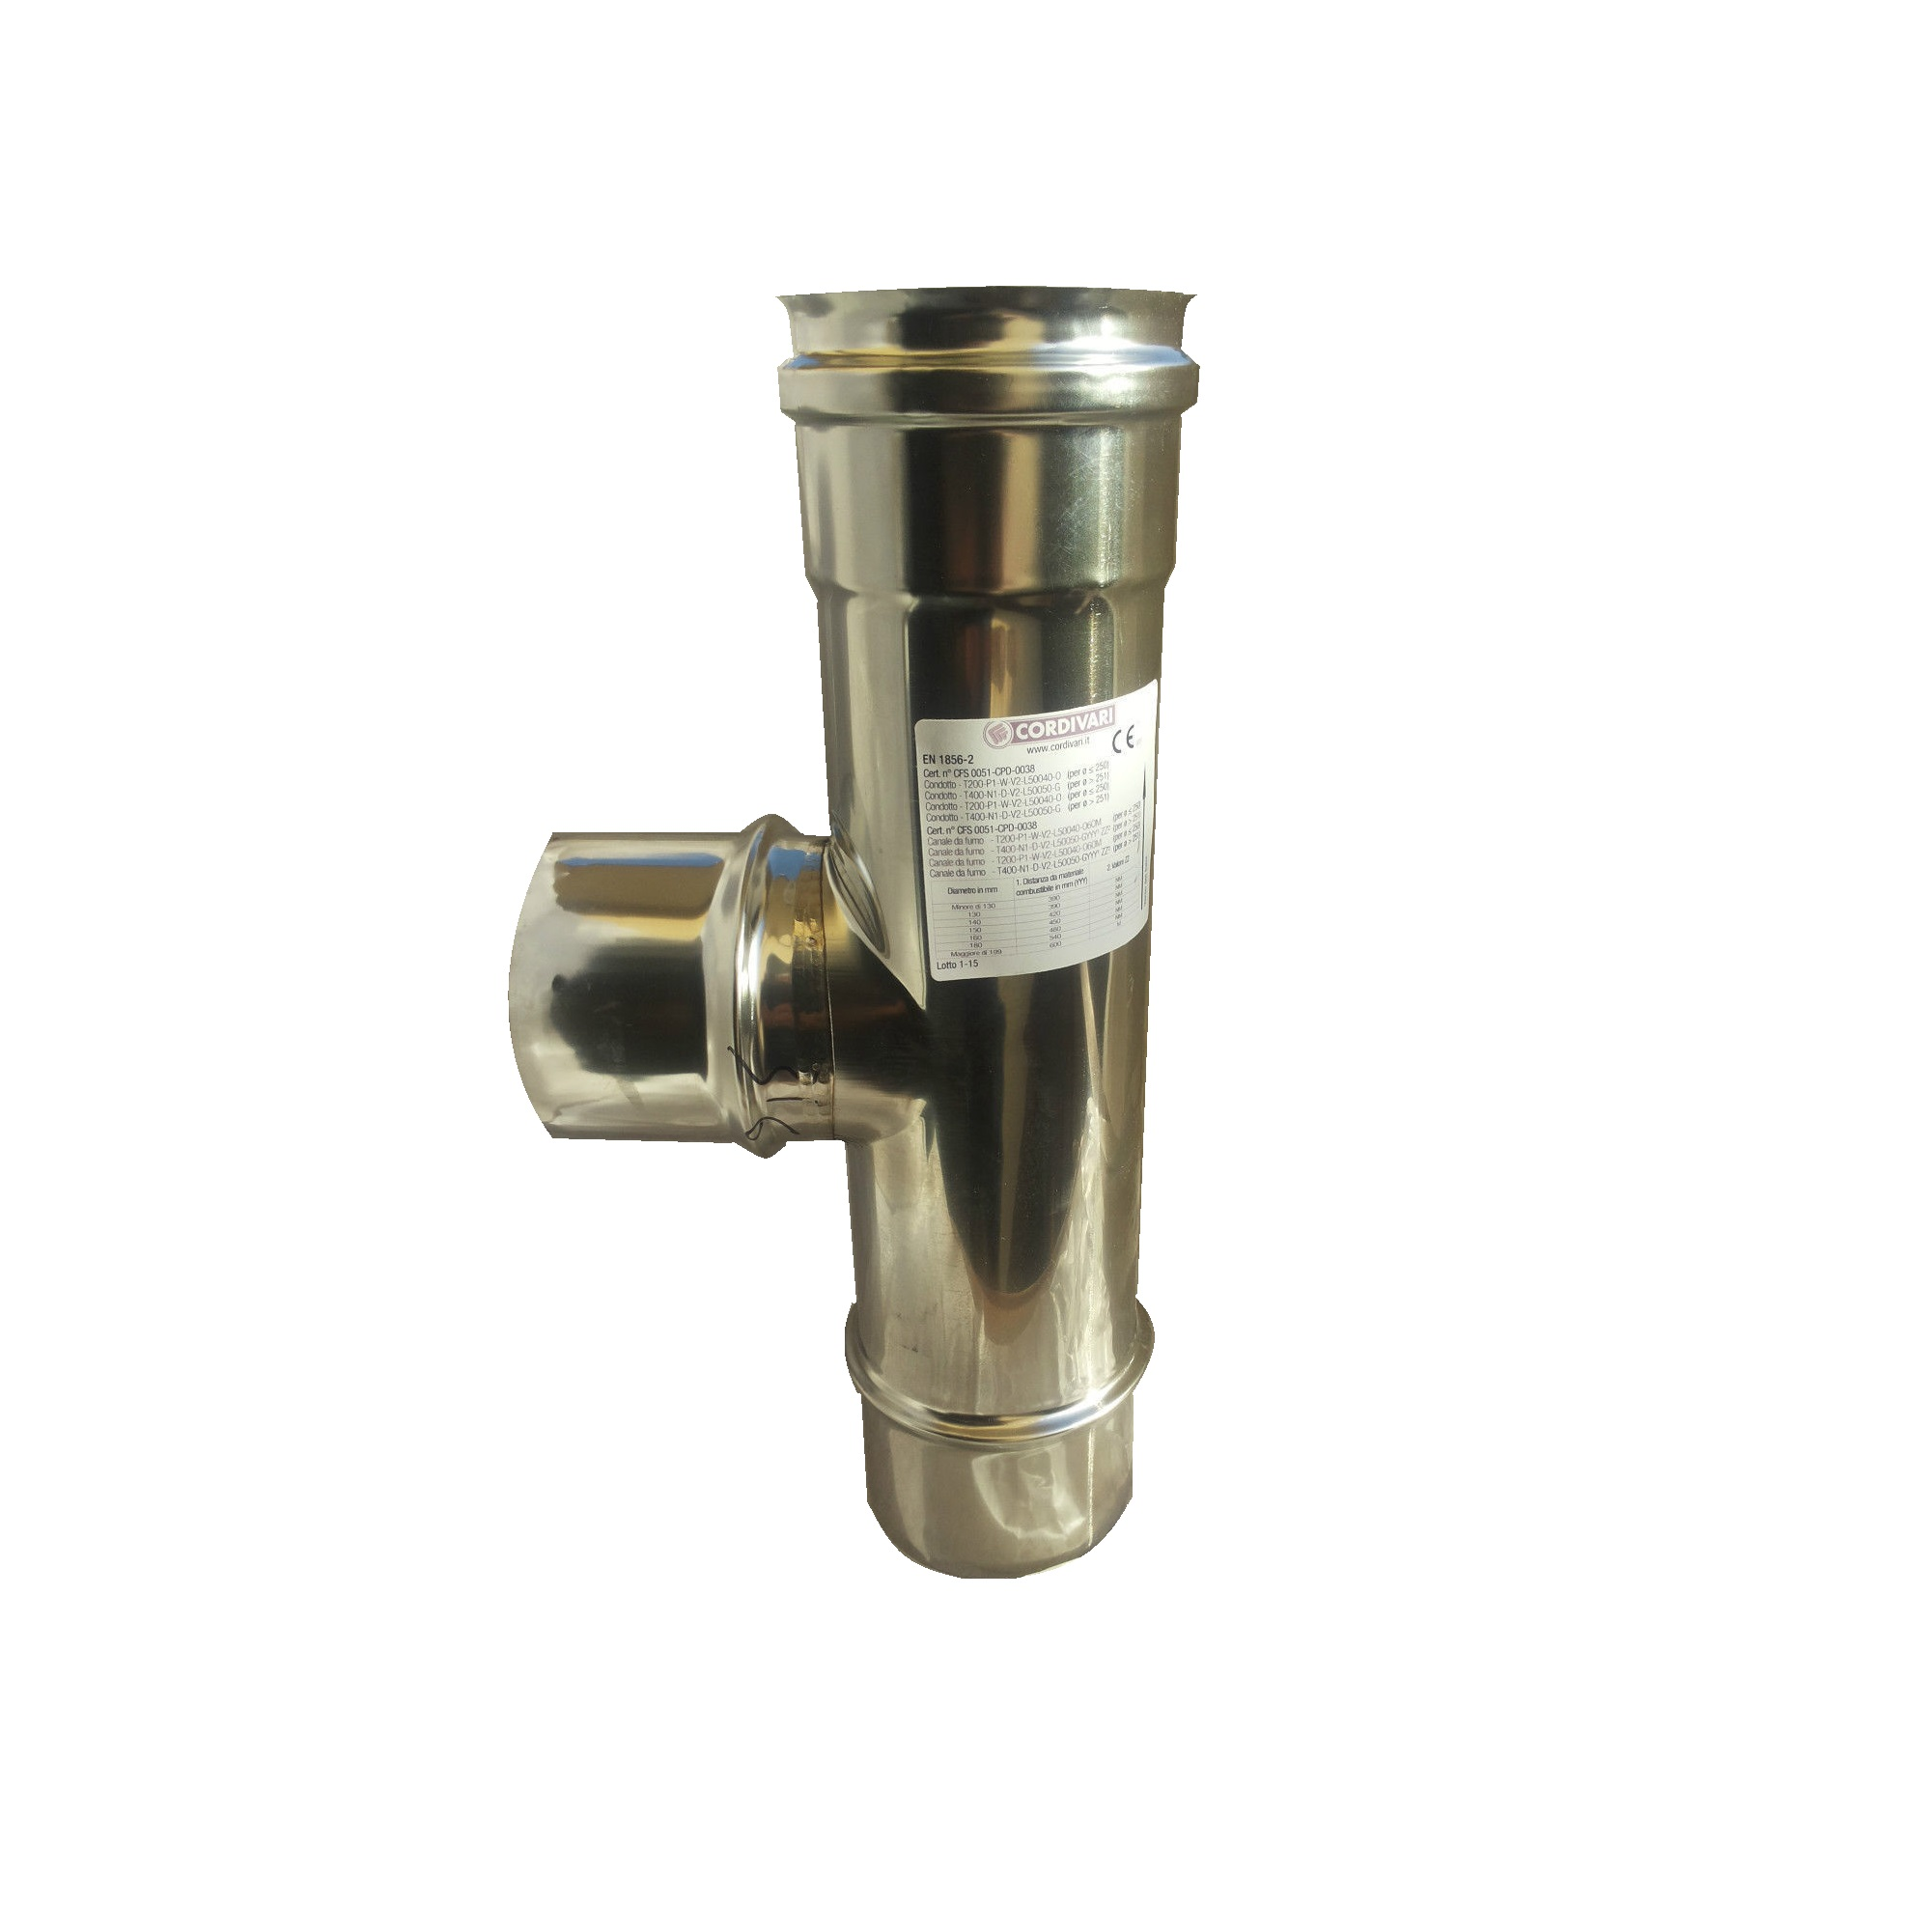 TUBI PER CANNA FUMARIA IN ACCIAIO INOX Ø80 AISI 304